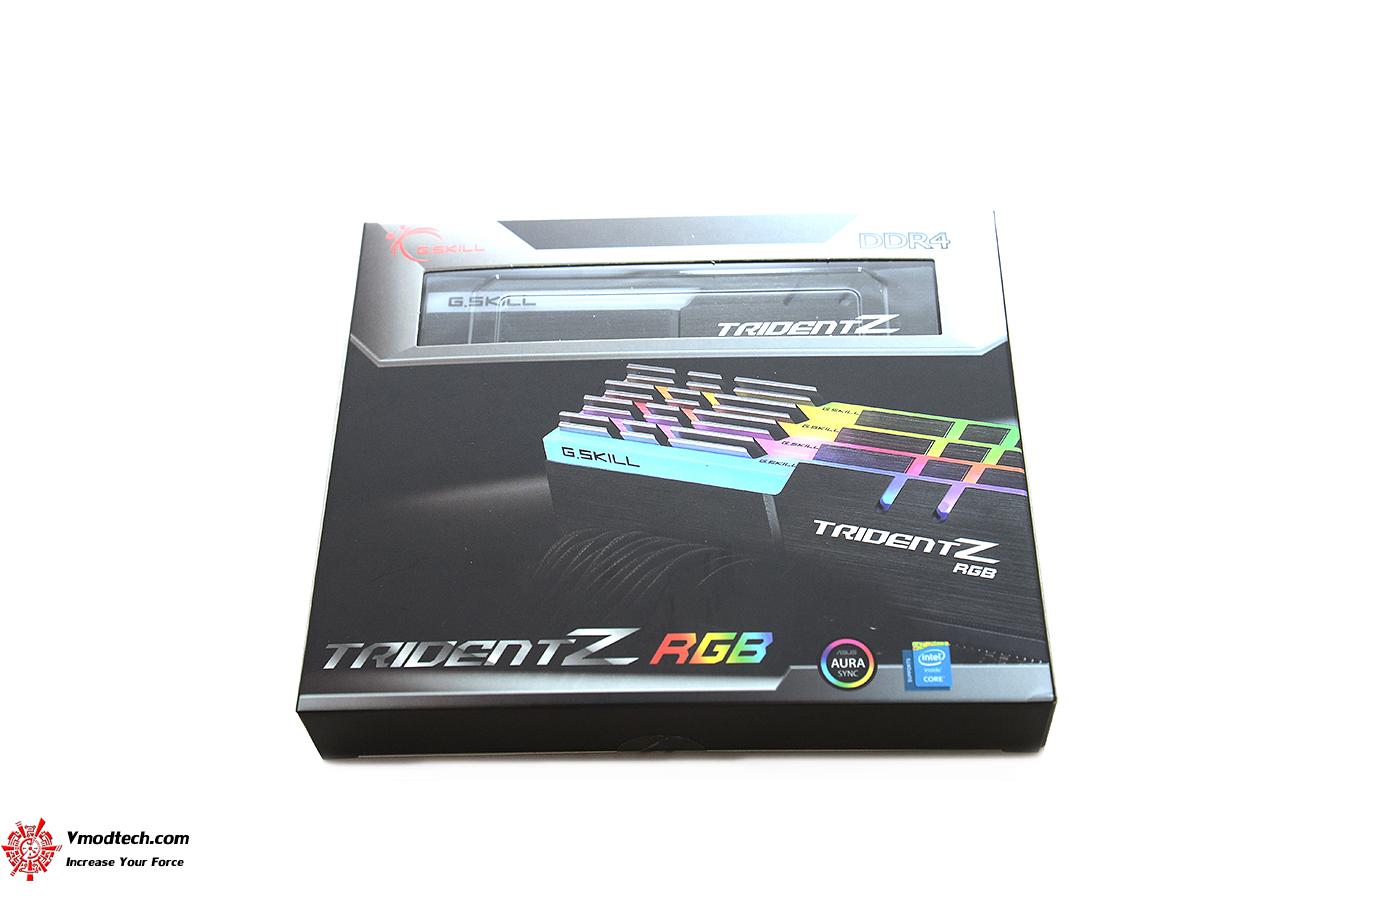 dsc 2896 G.SKILL Trident Z RGB DDR4 3200MHz 32GB (8GBx4) Quad Channel Review